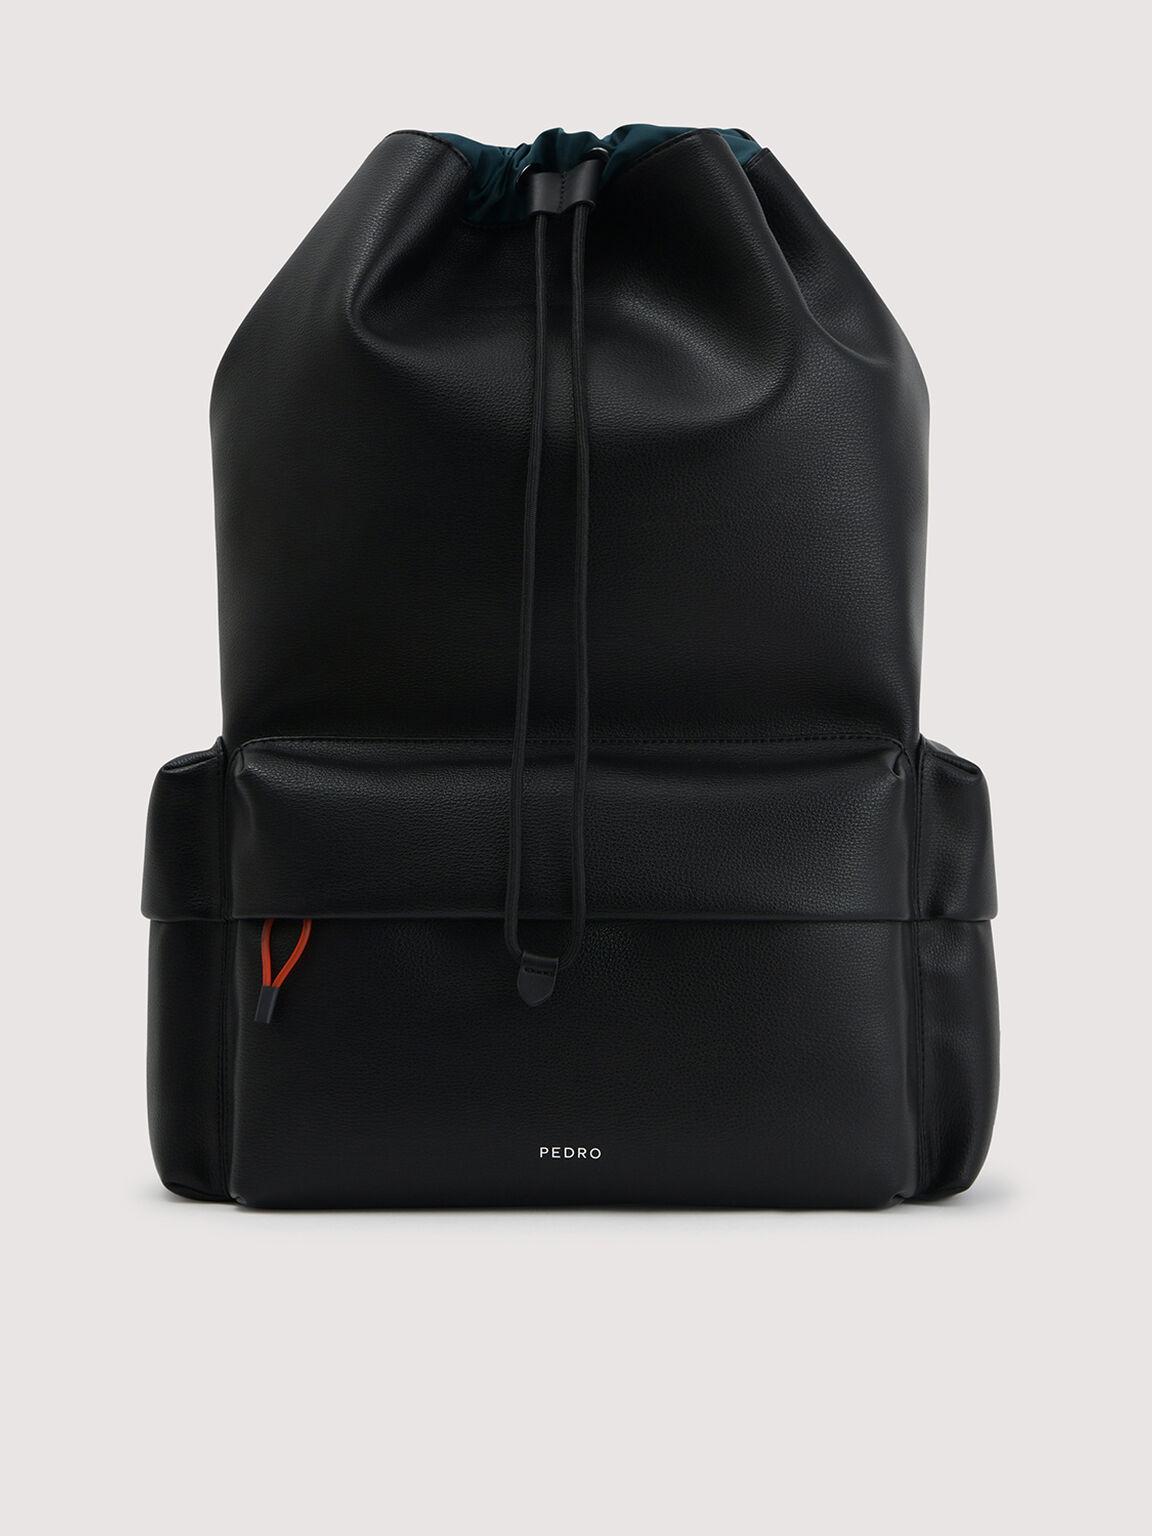 抽繩背包, 黑色, hi-res